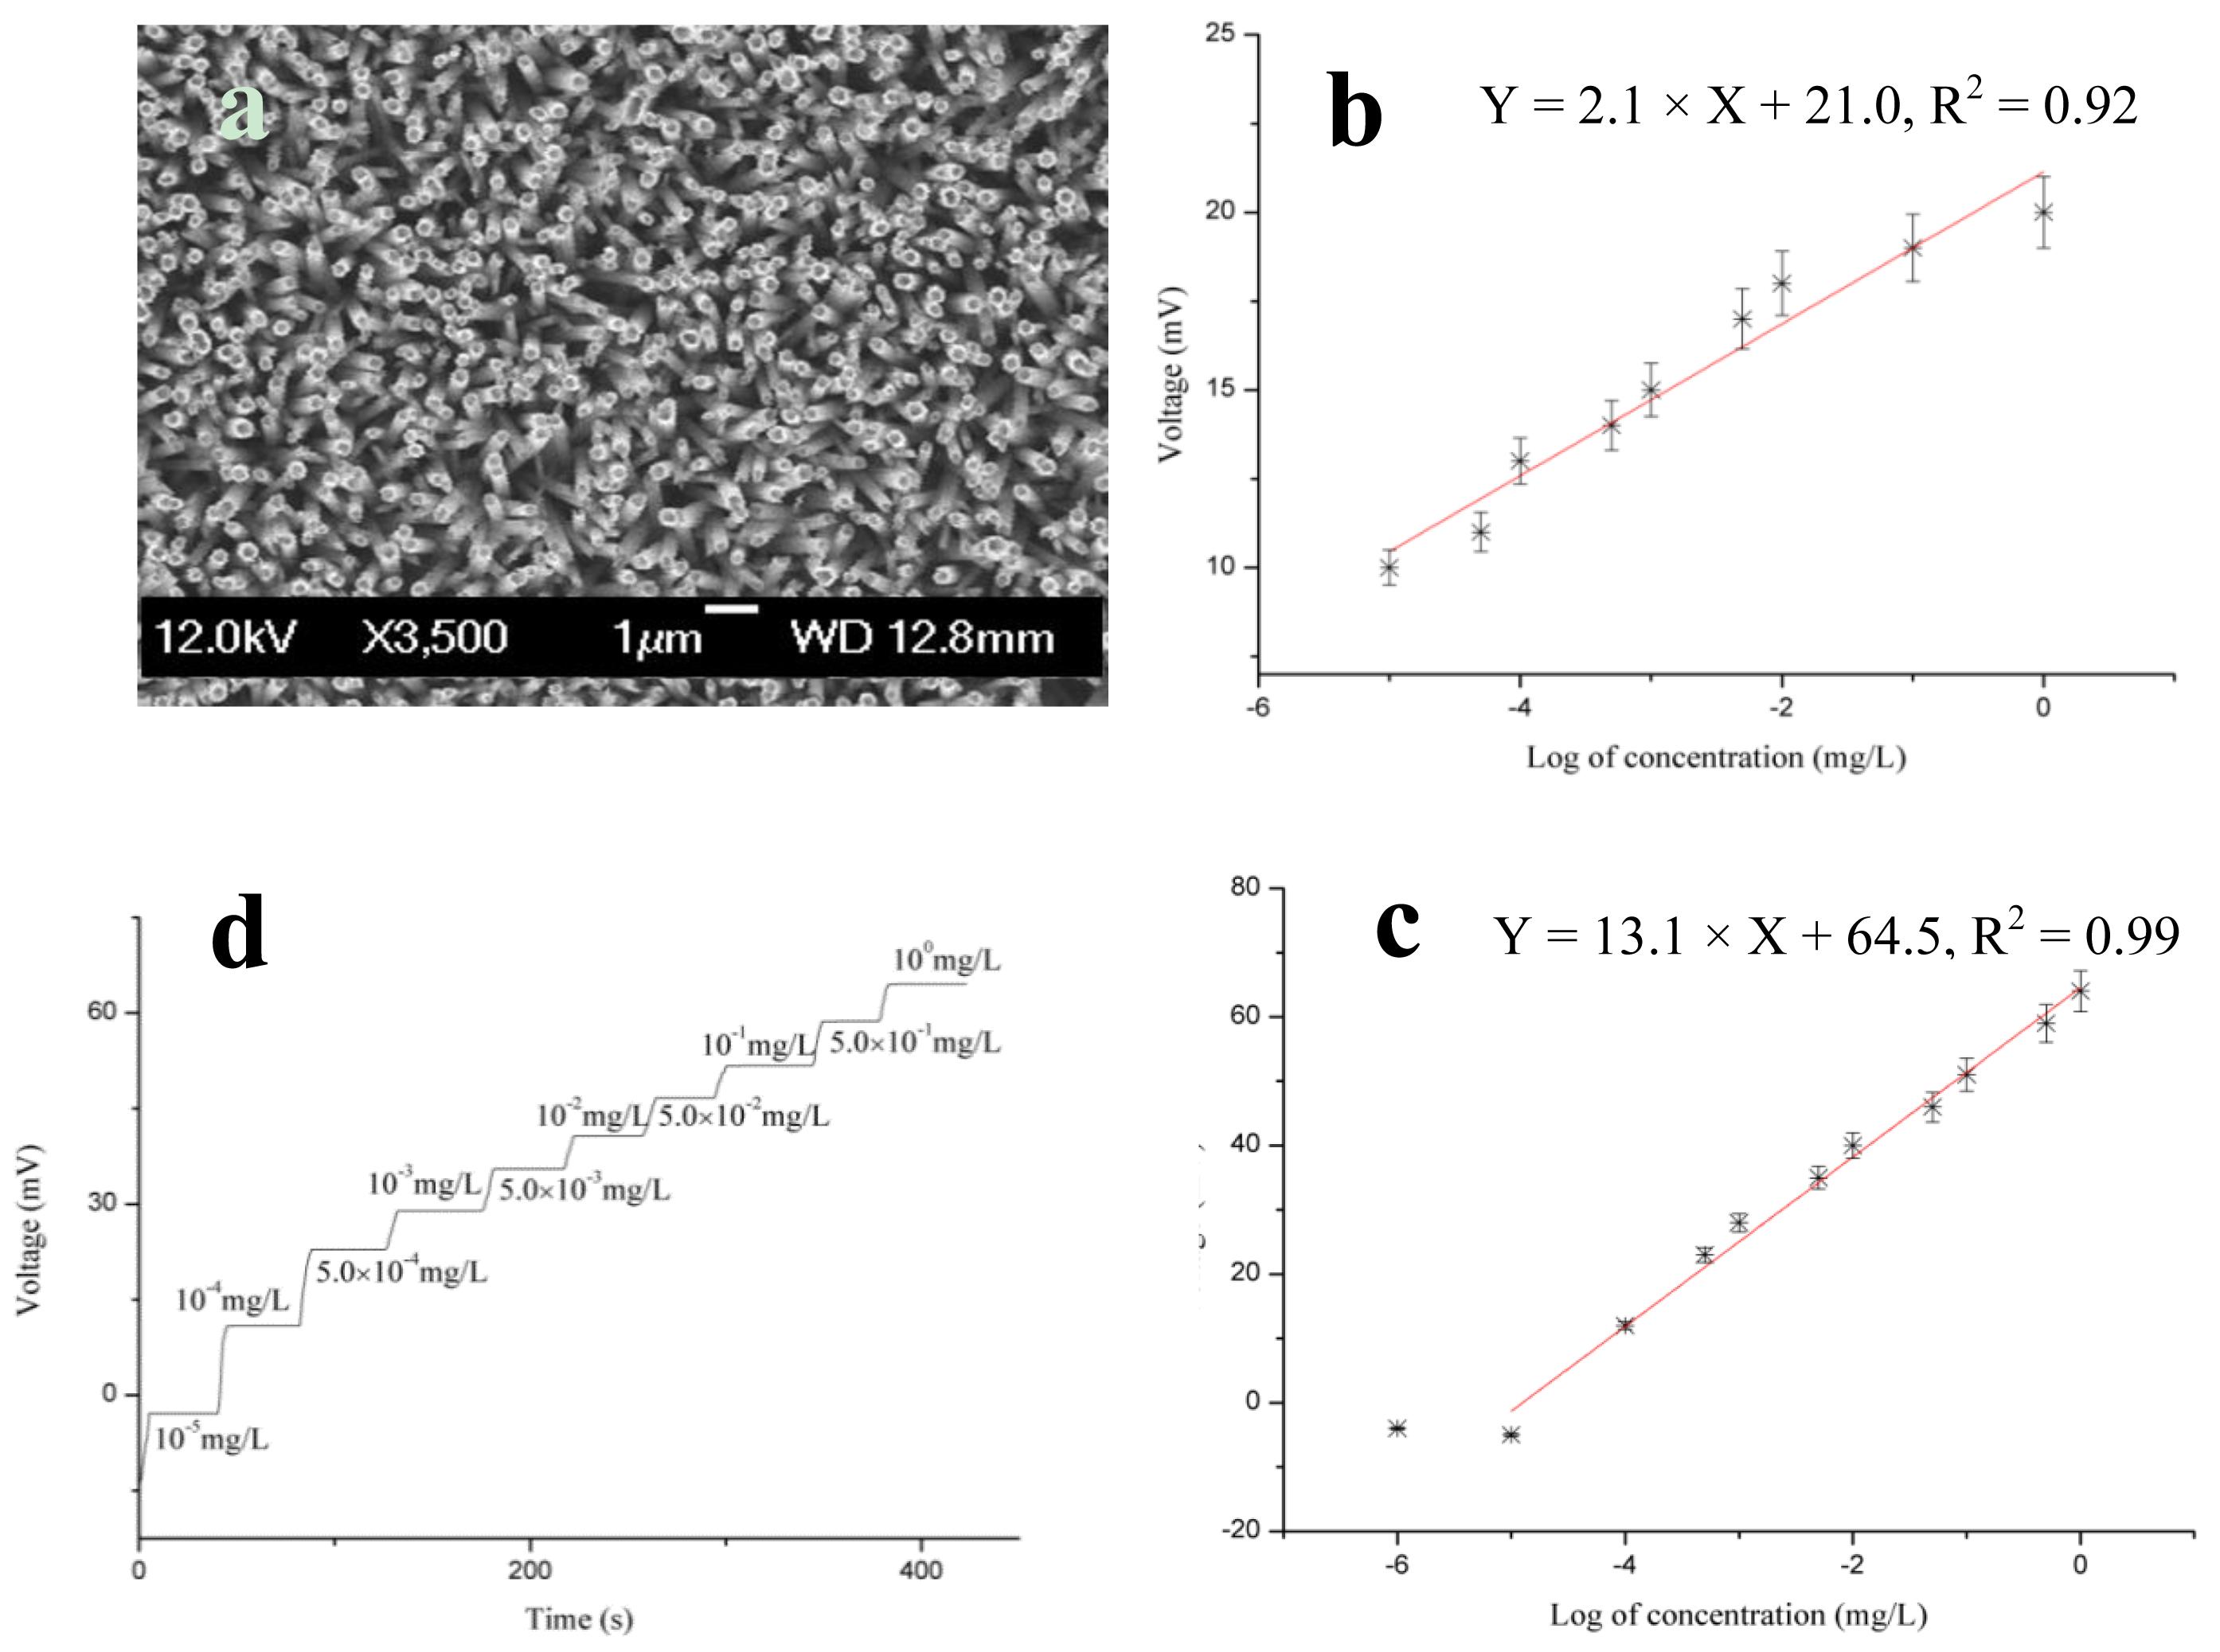 Sensors Free Full Text Metal Oxide Nanosensors Using Polymeric 2001 Kawasaki Vulcan 1500 Wiring Diagram Schematic 14 08605f5 1024